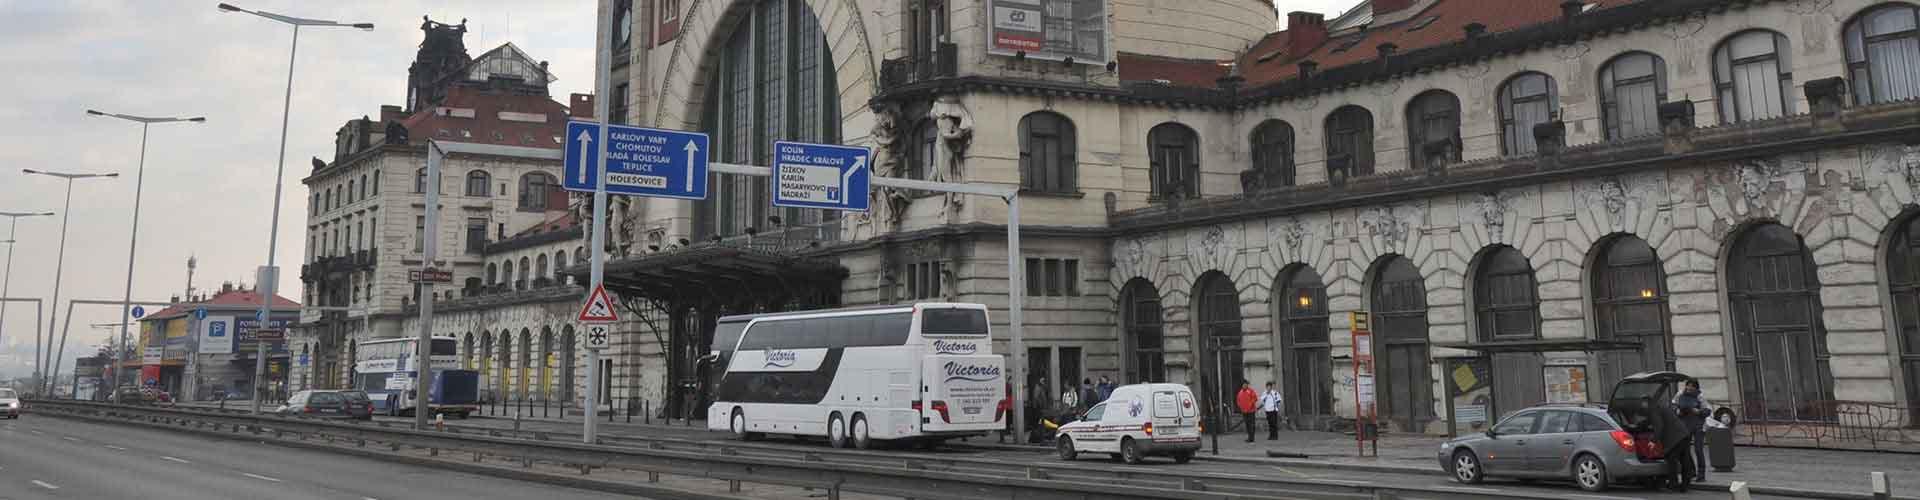 Praga - Hostales cerca a Estación de tren de Hlavní nádraží. Mapas de Praga, Fotos y comentarios de cada Hostal en Praga.